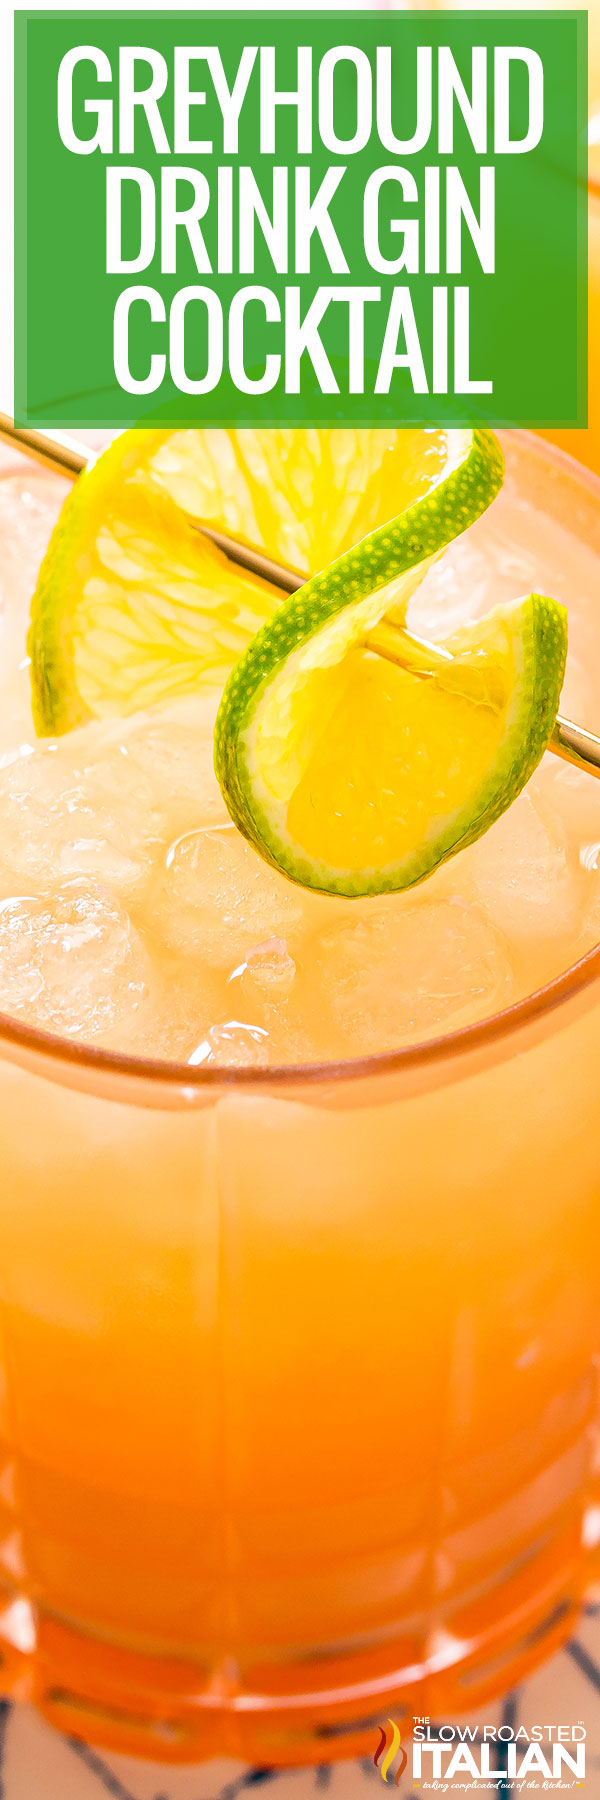 Greyhound Drink (Gin Cocktail) closeup